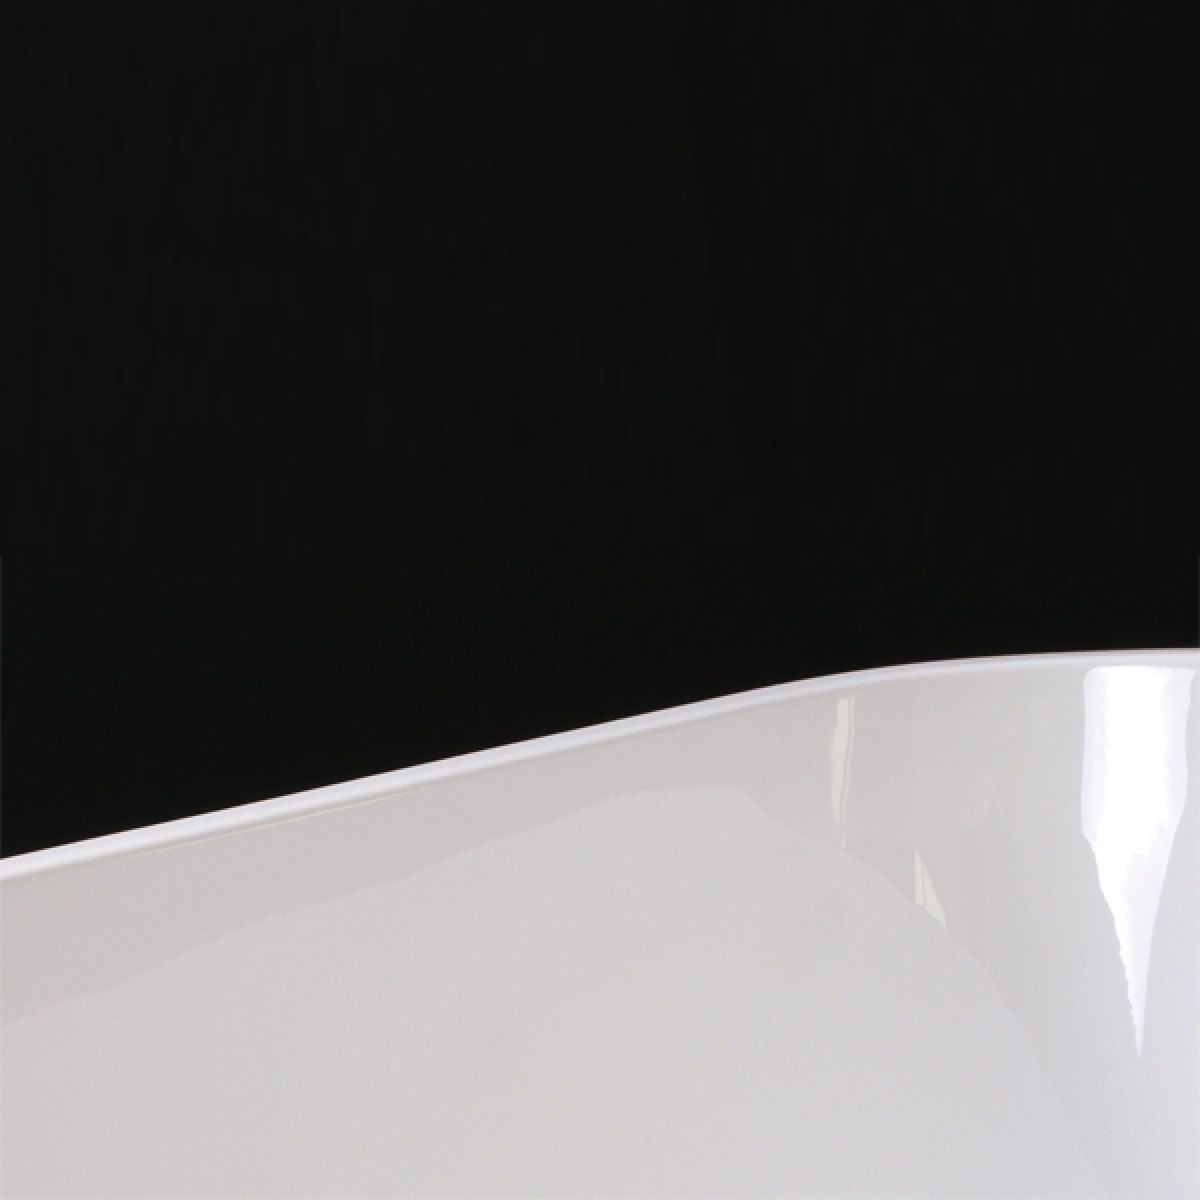 royce-morgan-black-range-onyx-freestanding-bath